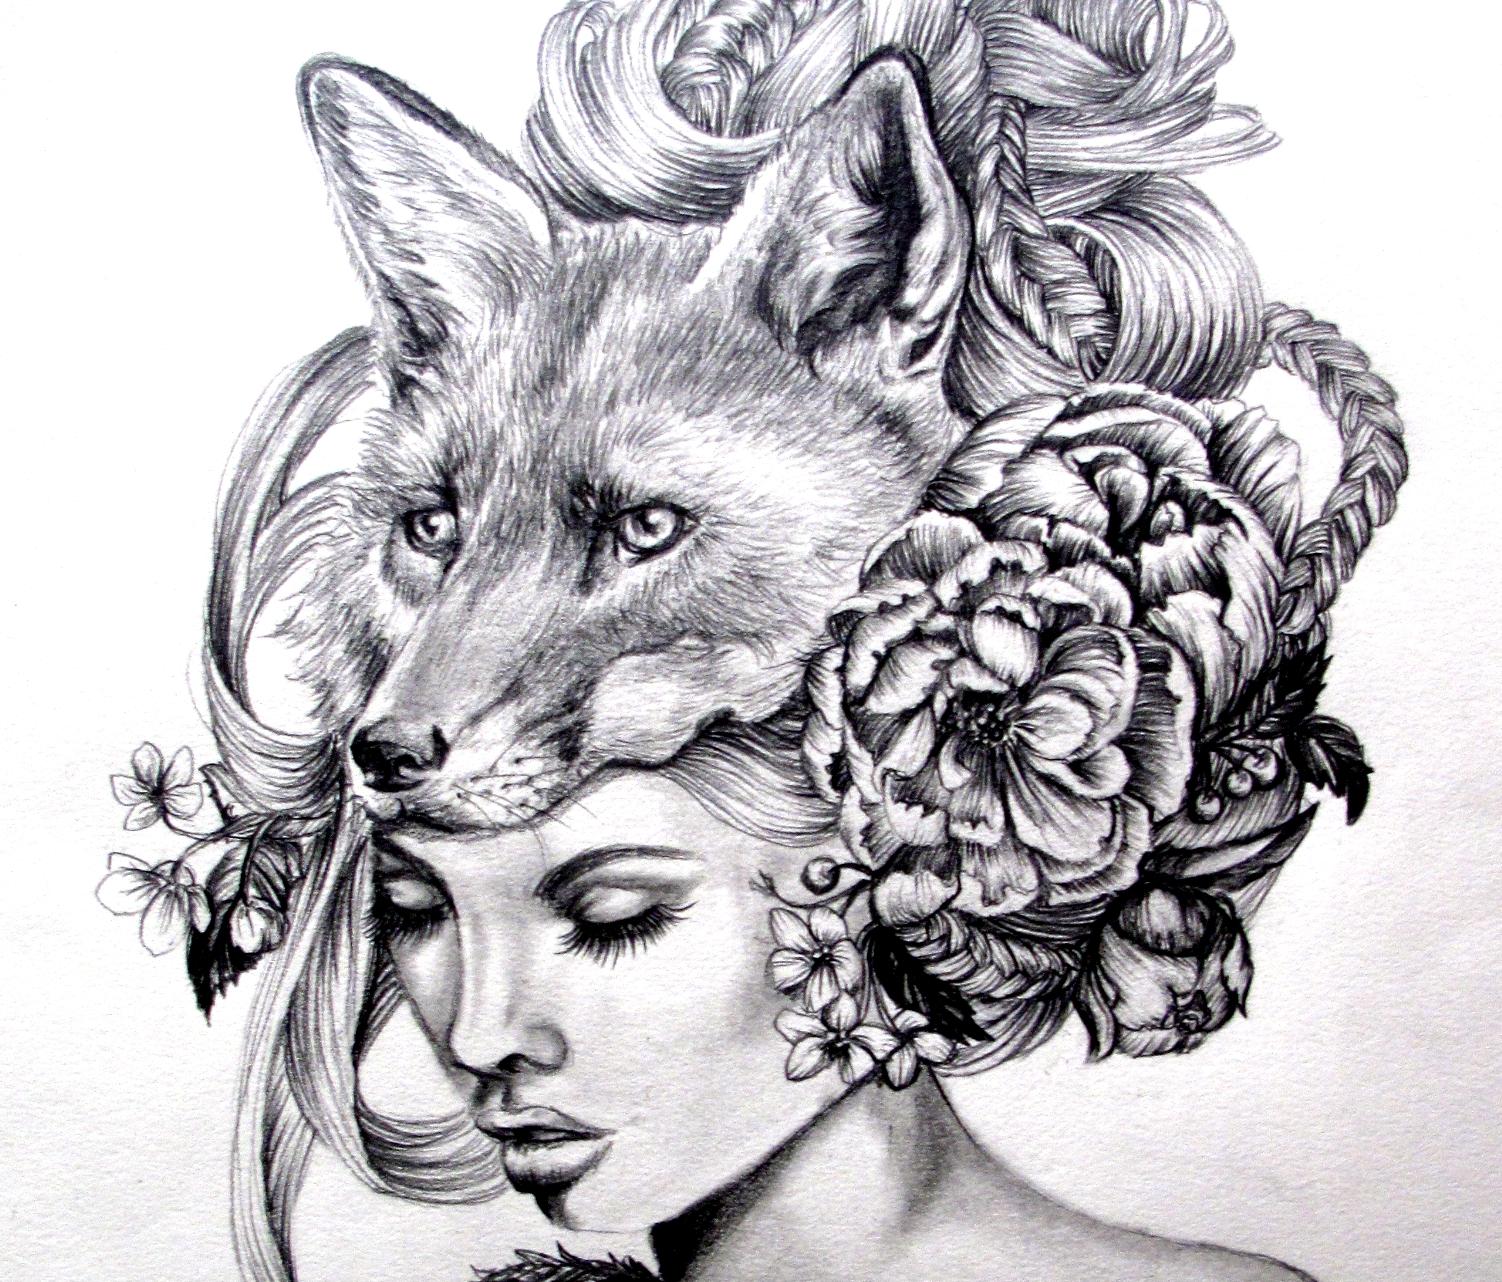 Drawn steampunk headdress Fox portrait mask and woman